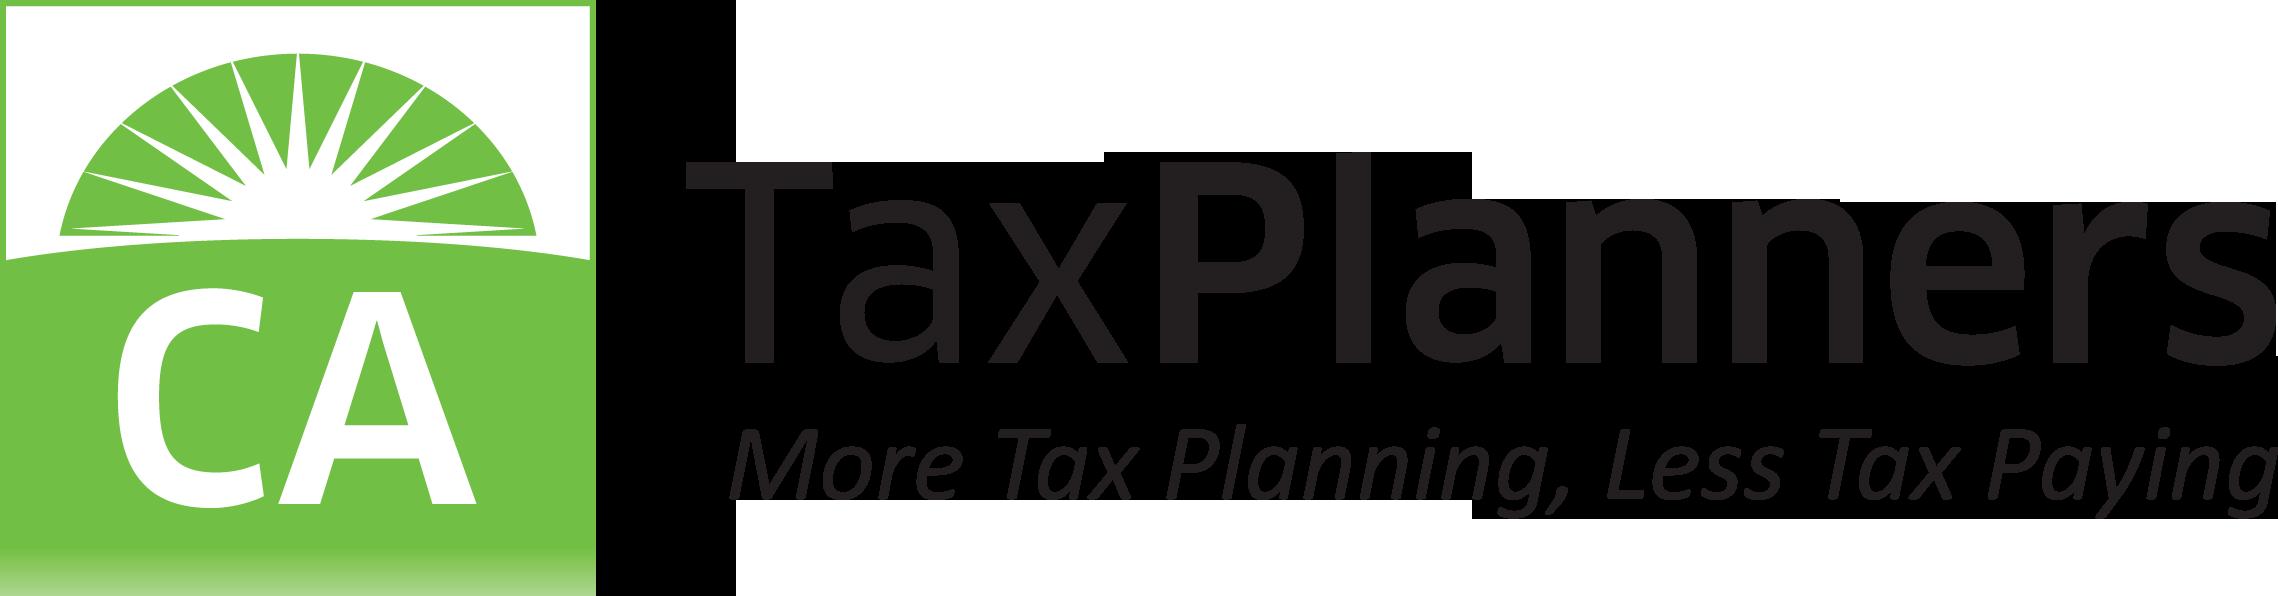 Tax Planners El Segundo, CA California Retirement Advisors